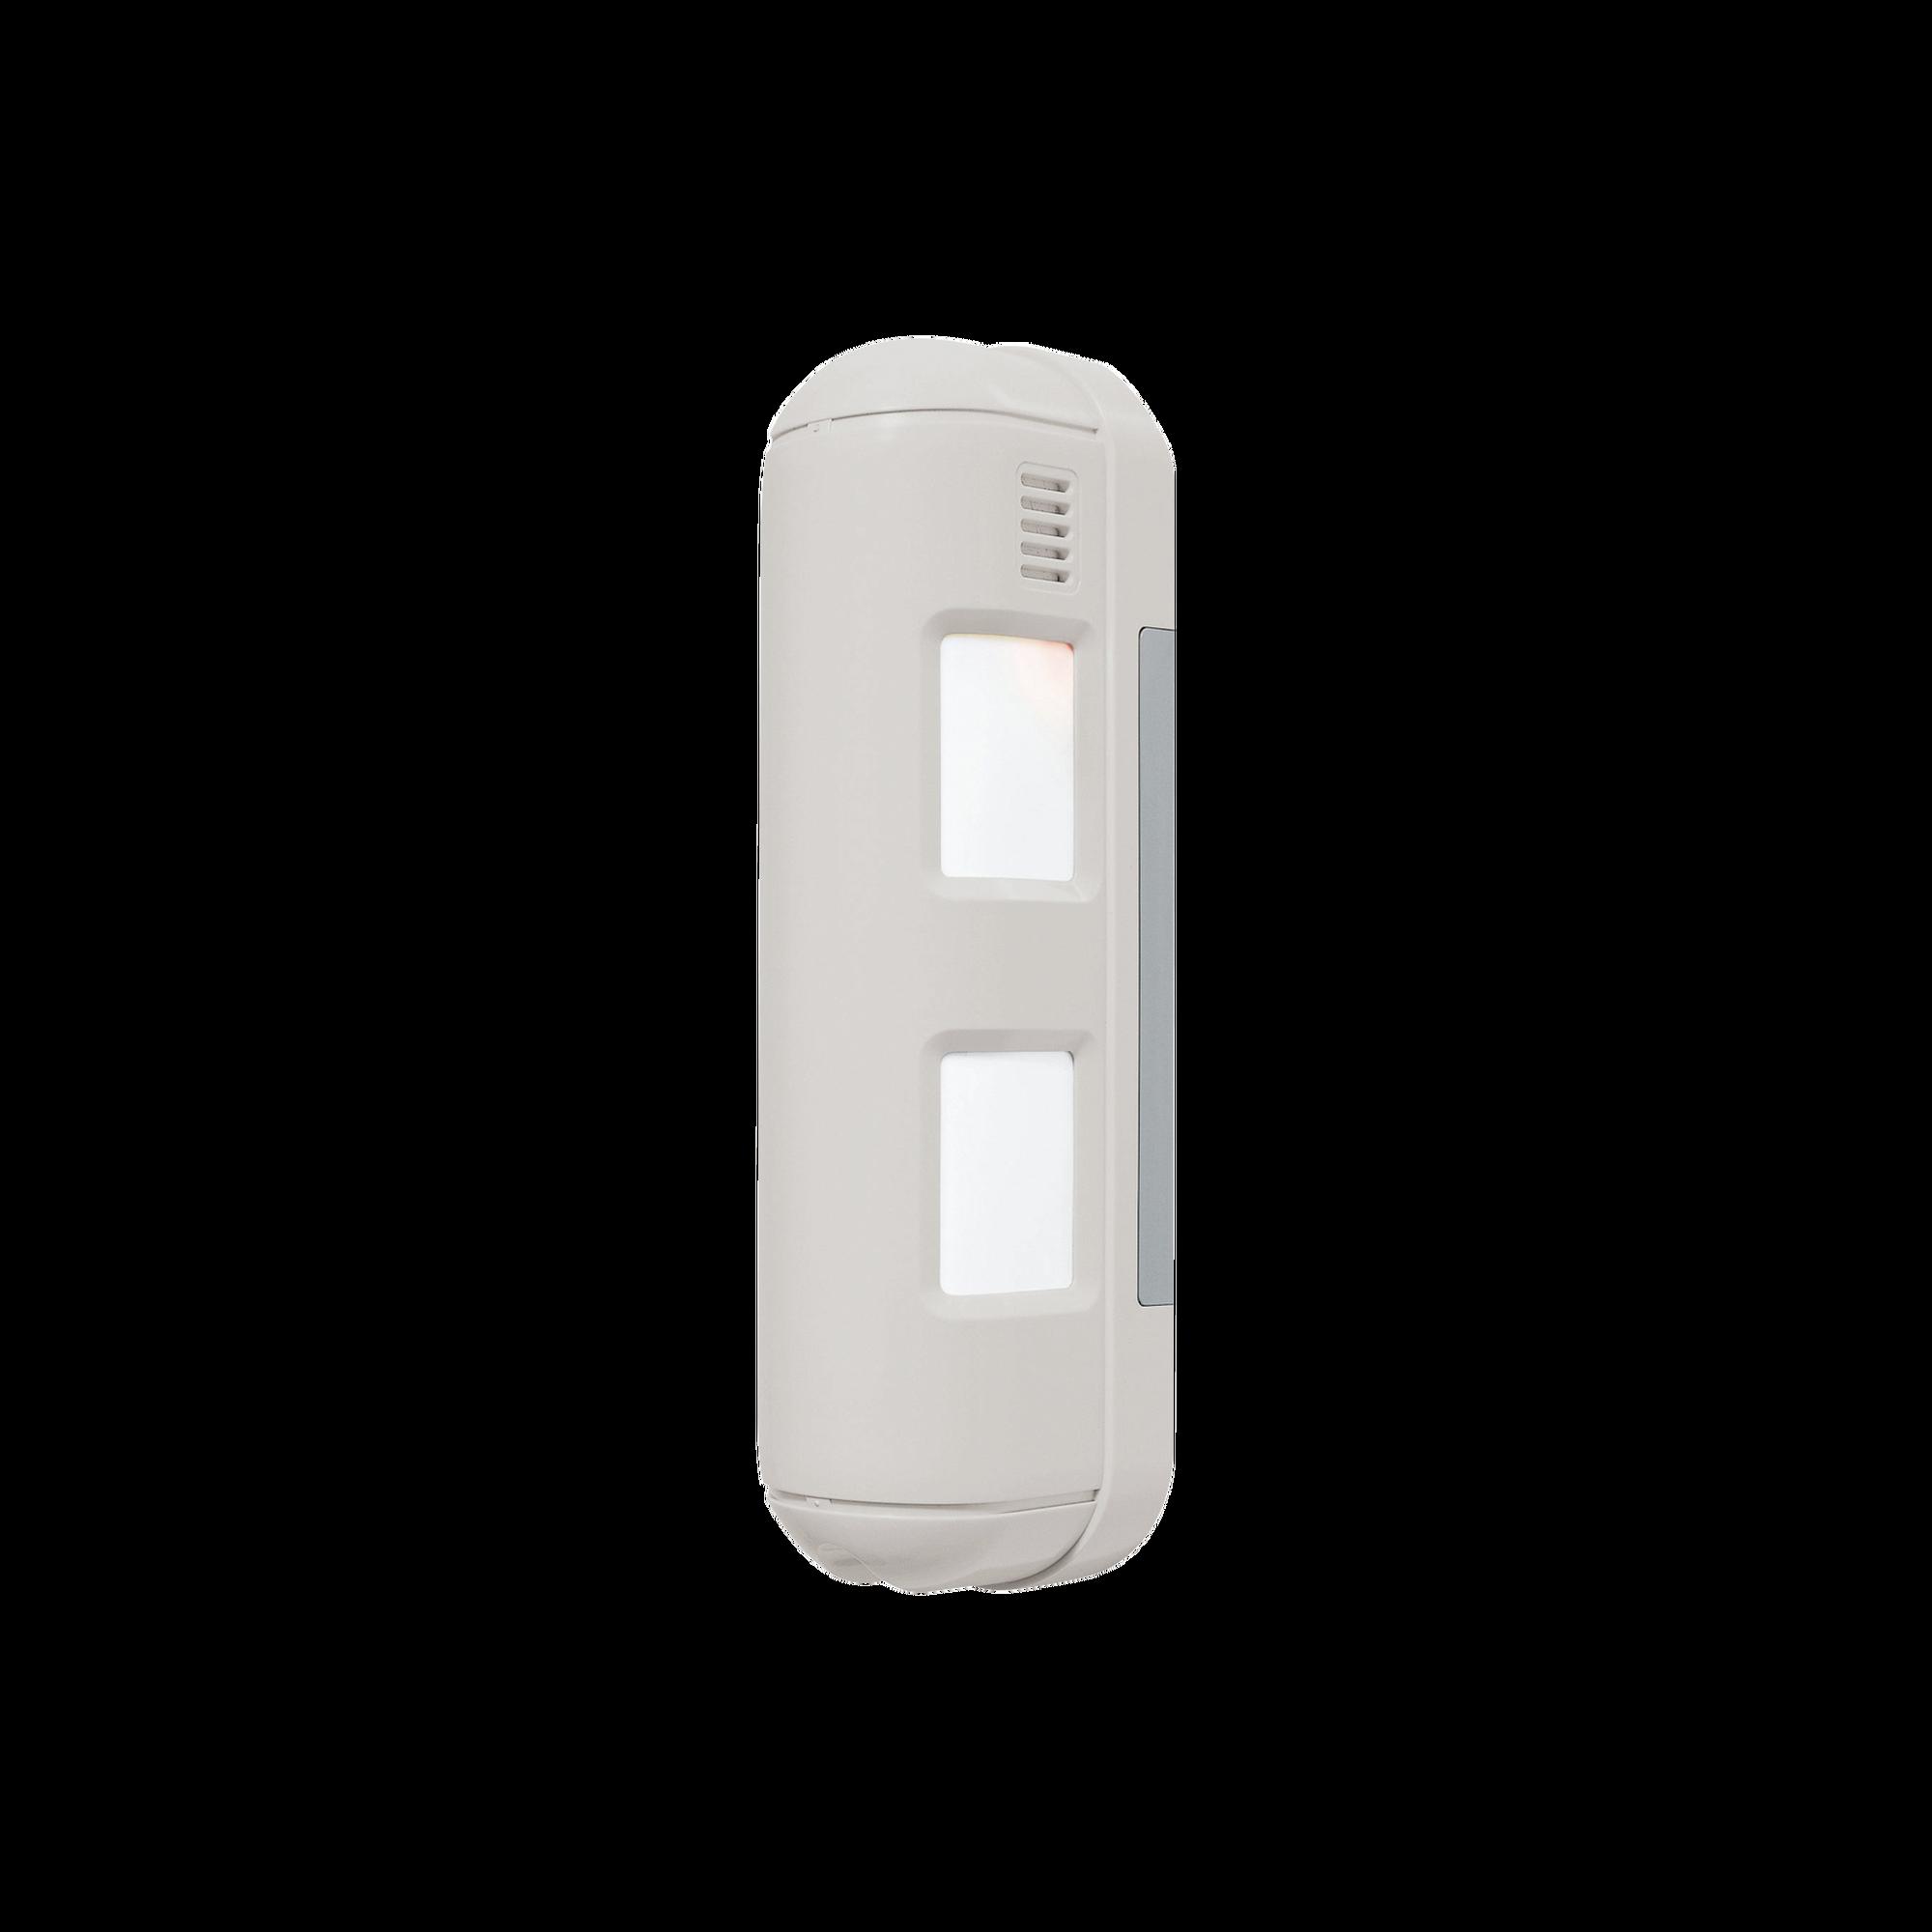 PIR de doble cobertura, ideal para lugares angostos, fachadas o generar bardas virtuales hasta 24 metros